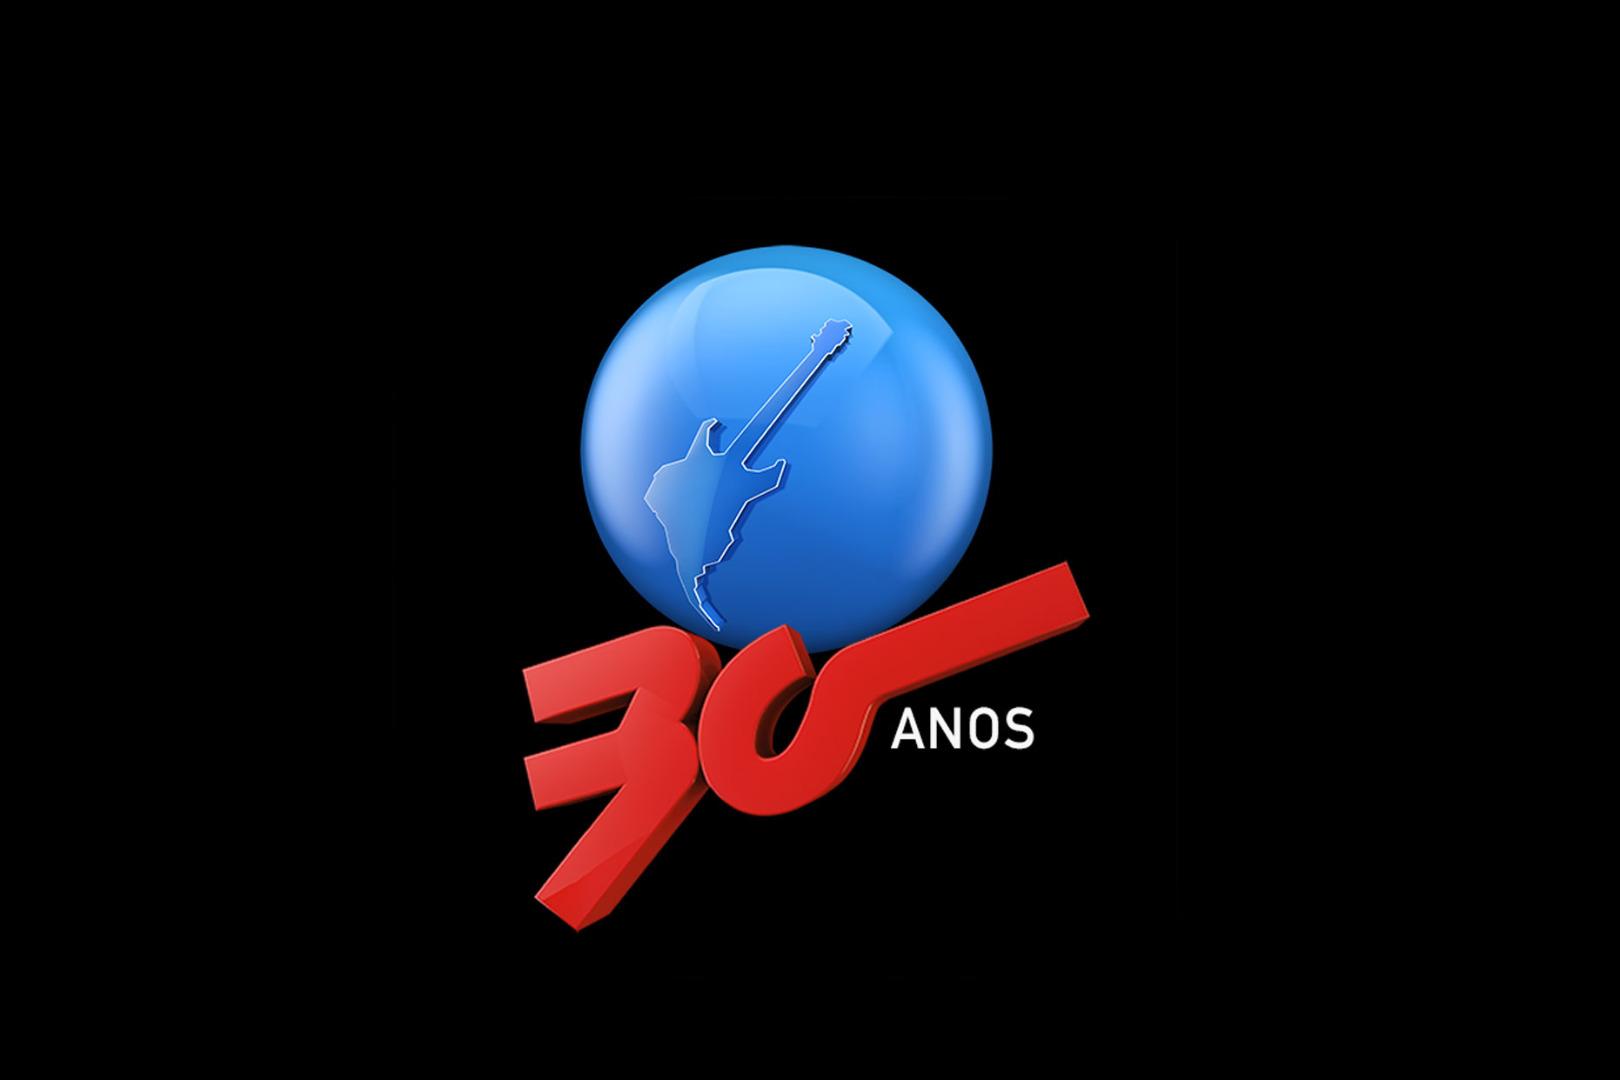 Rock in Rio 30 anos - Guitarra autografada por vários artistas